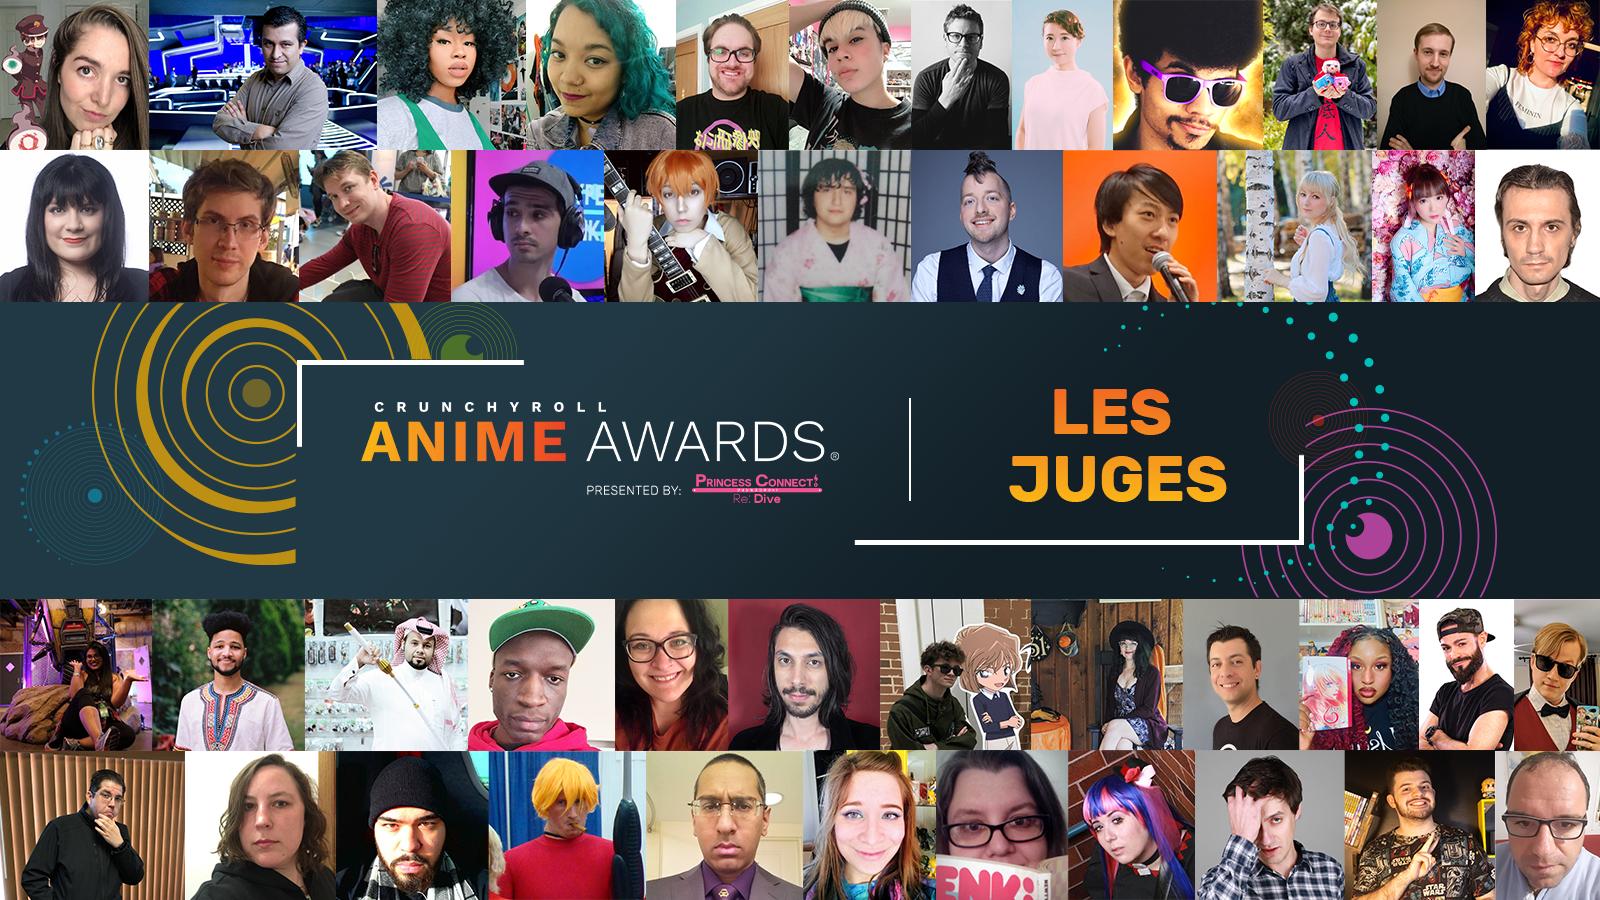 Crunchyroll Animes Awards